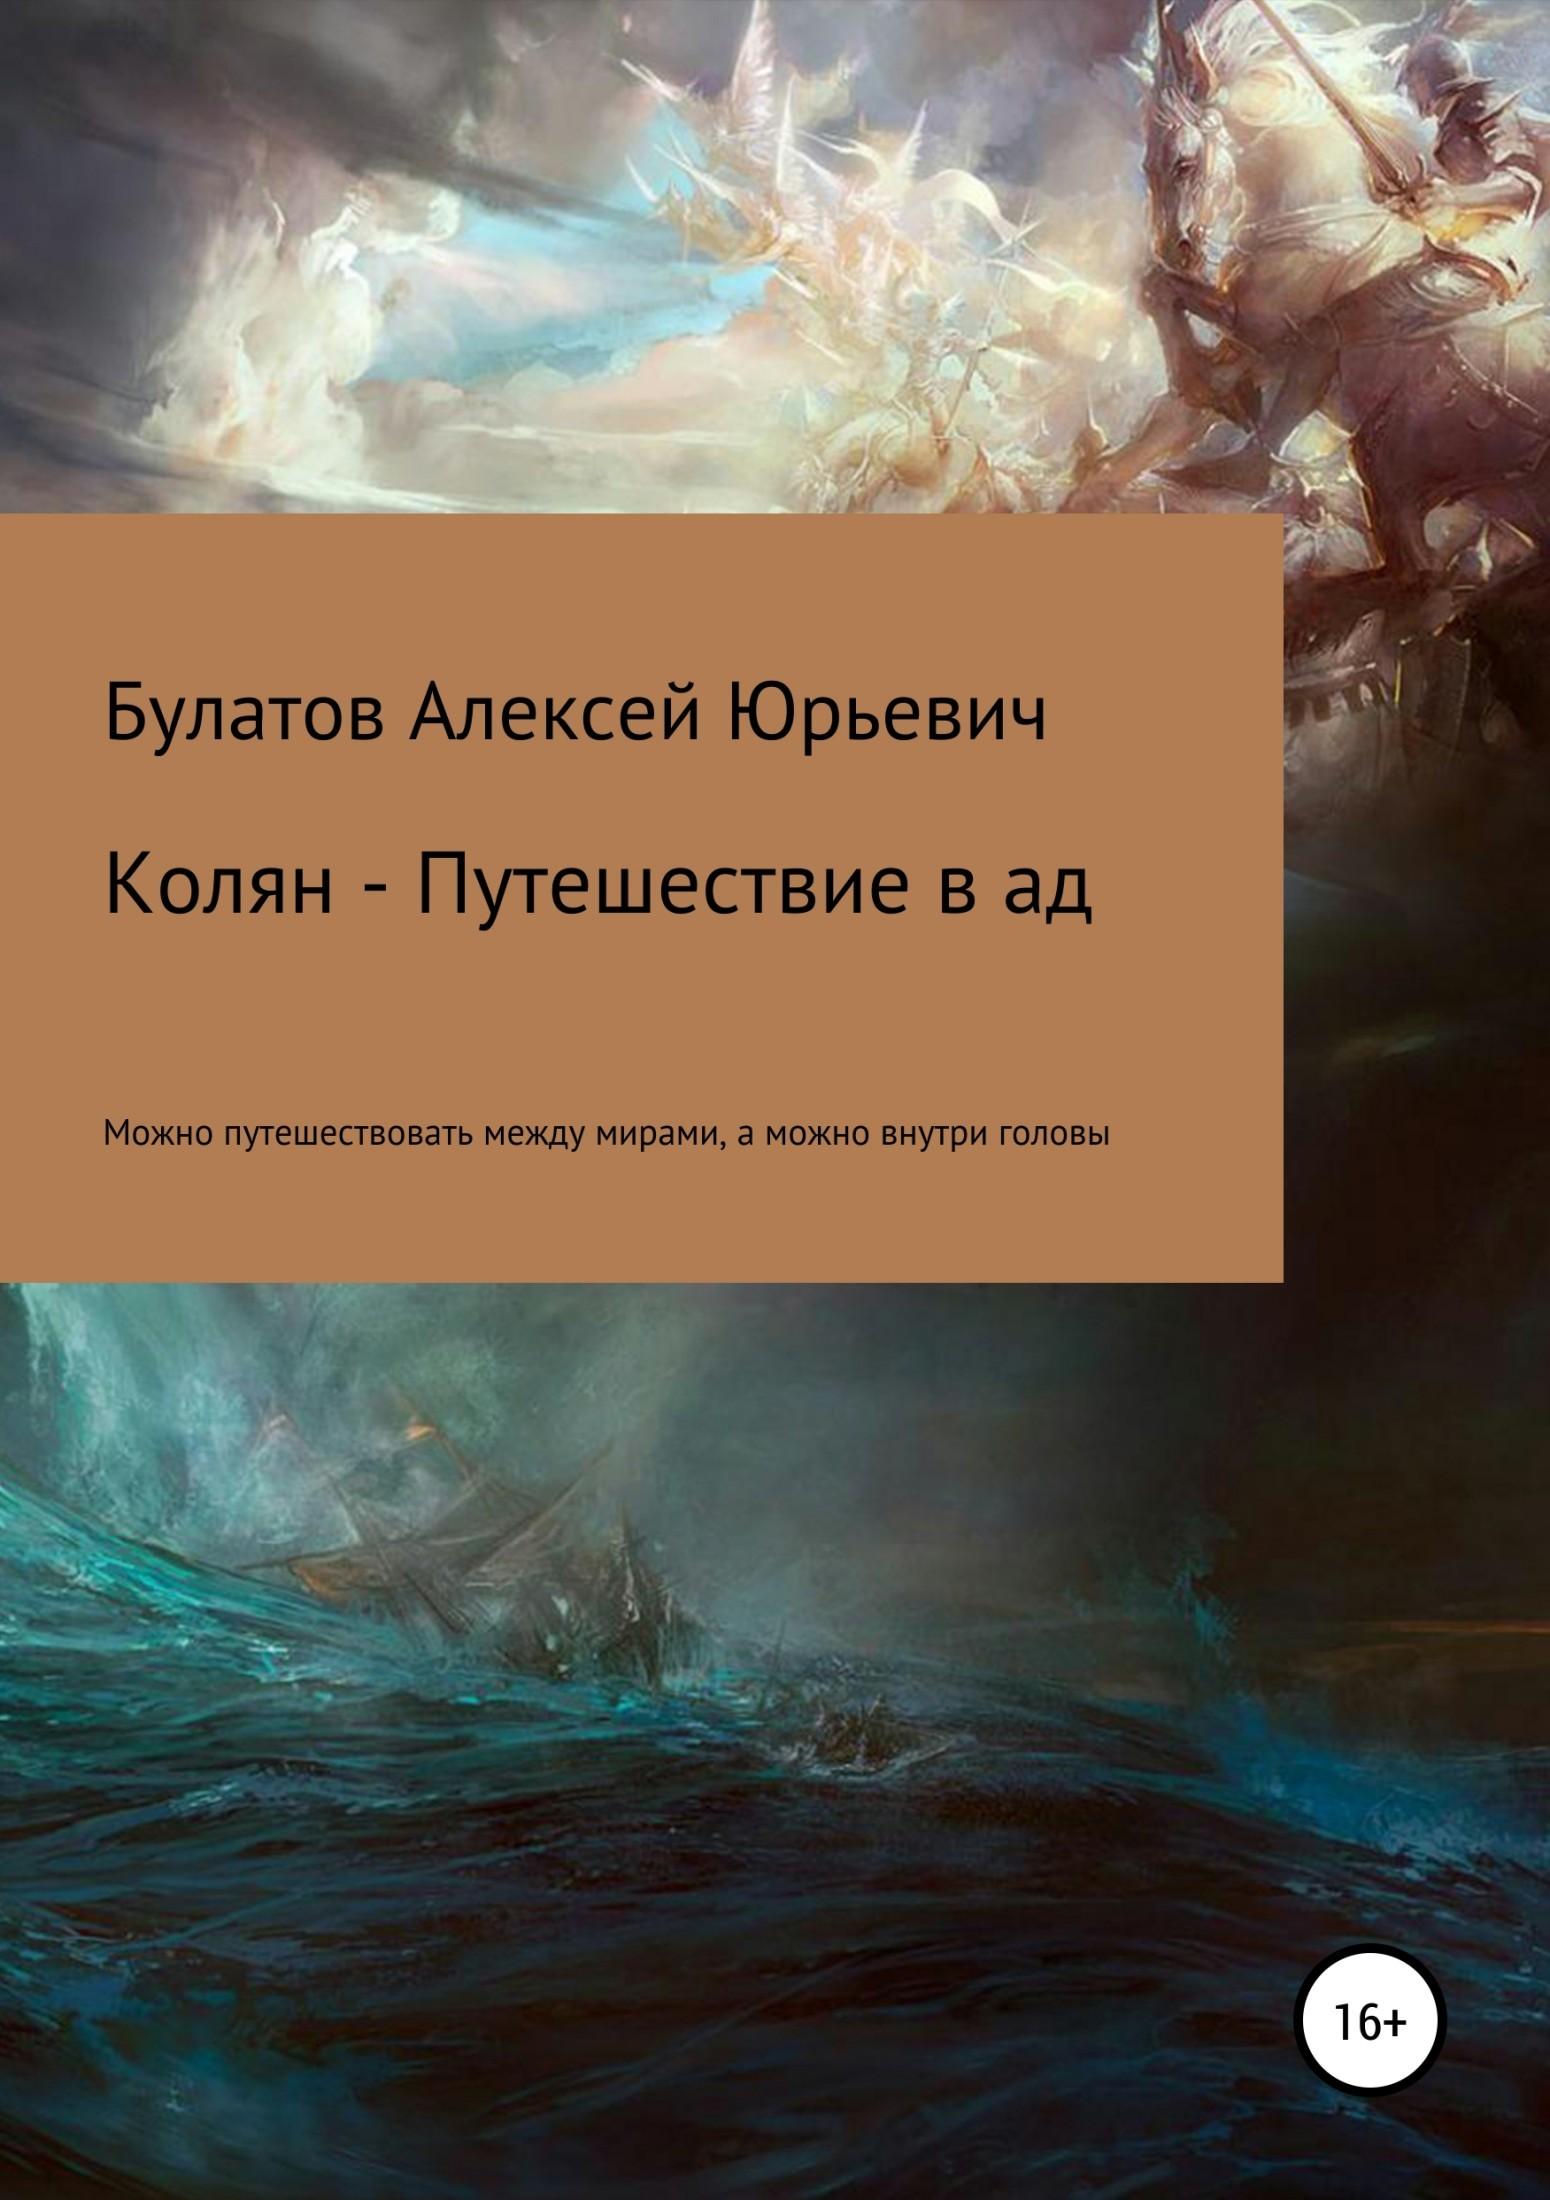 Алексей Юрьевич Булатов Колян – путешествие в ад колян 86